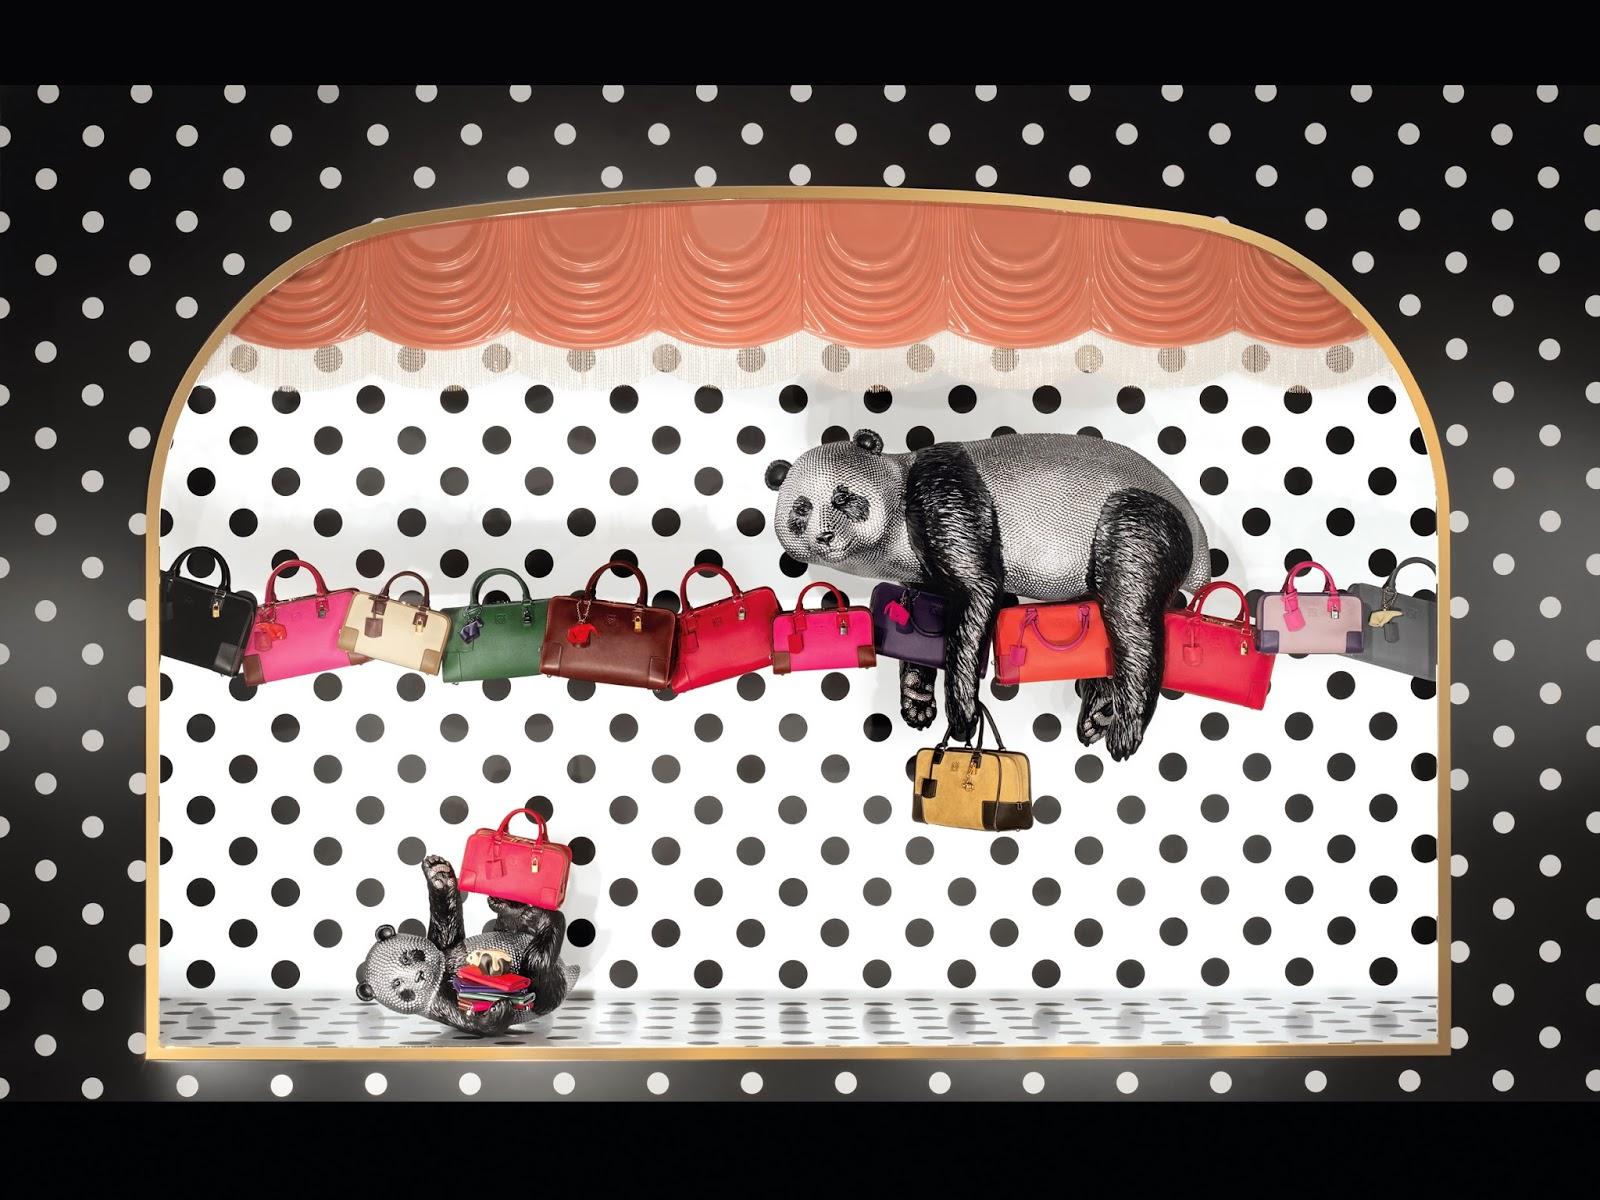 Of Pandas and Elephants: Loewe's Brilliant Windows for Christmas!